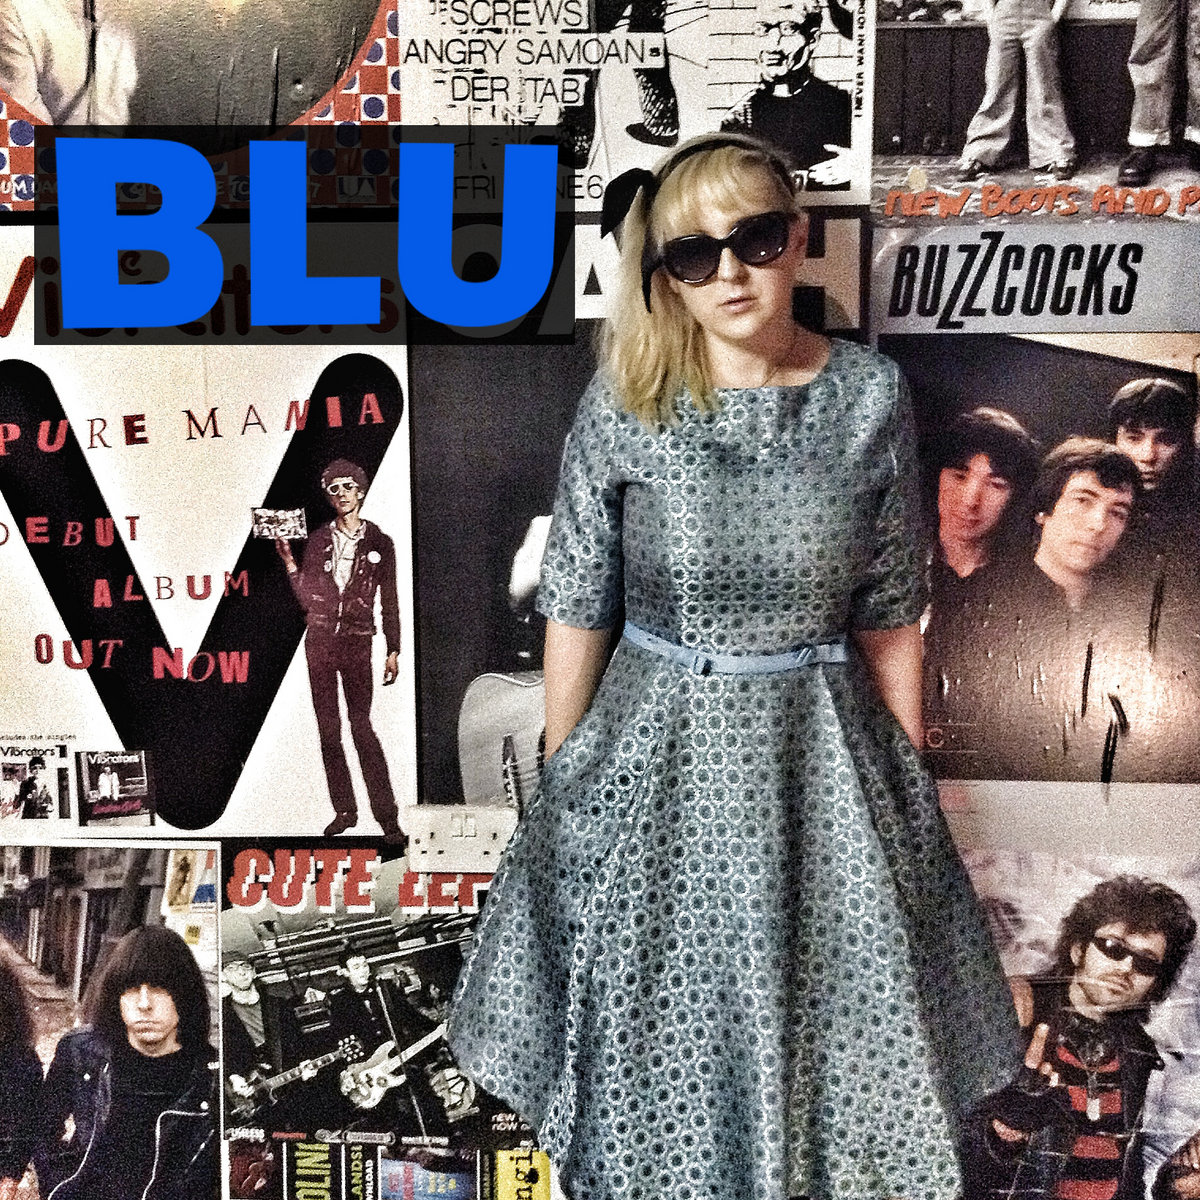 Suzy Blu artwok